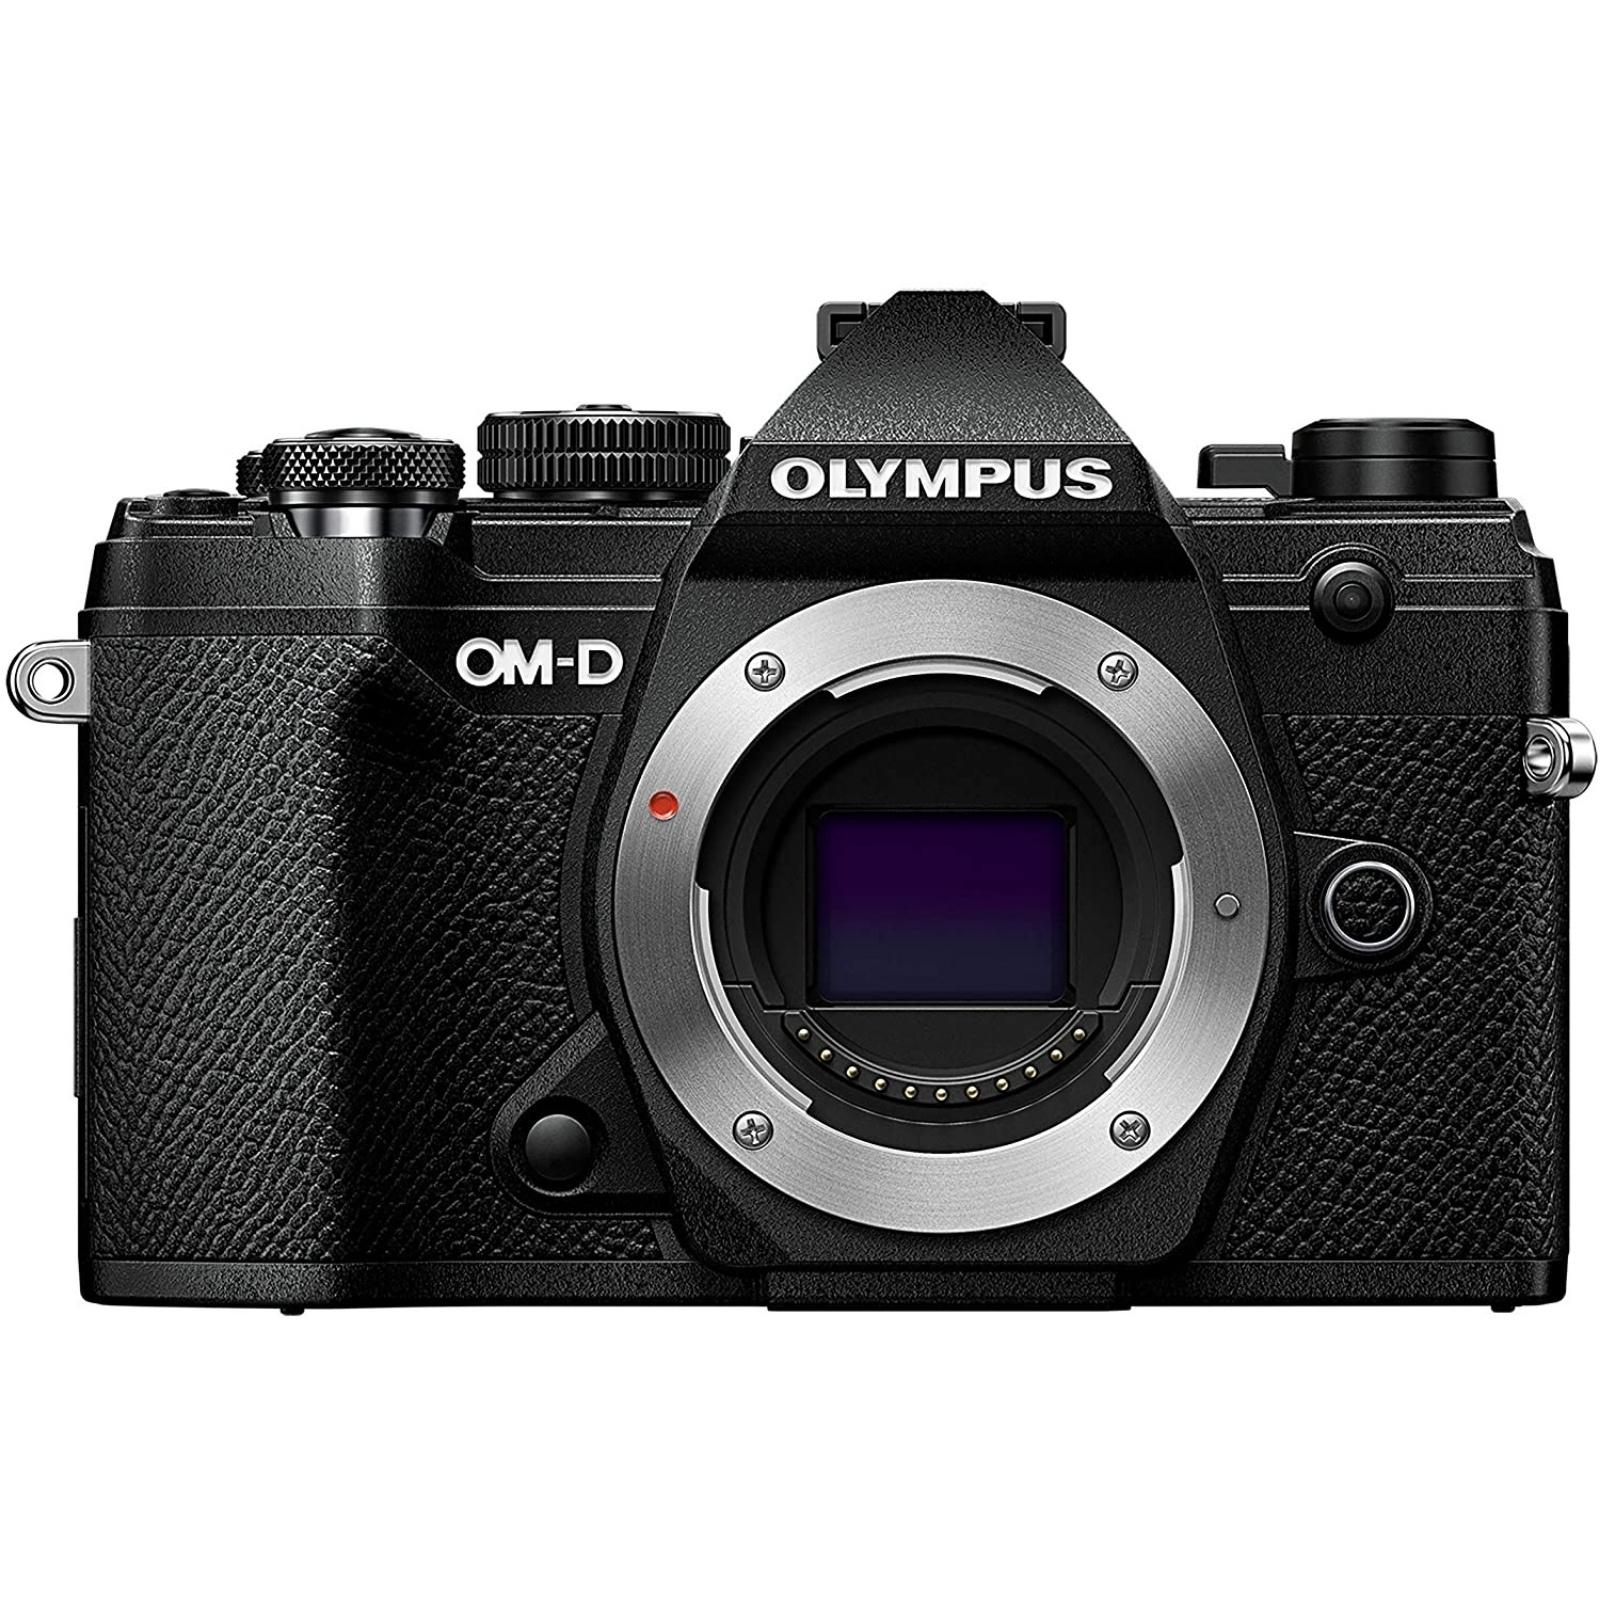 OLYMPUS オリンパス ミラーレス一眼カメラ OM-D E-M5 MarkIII ボディ ブラック 新品